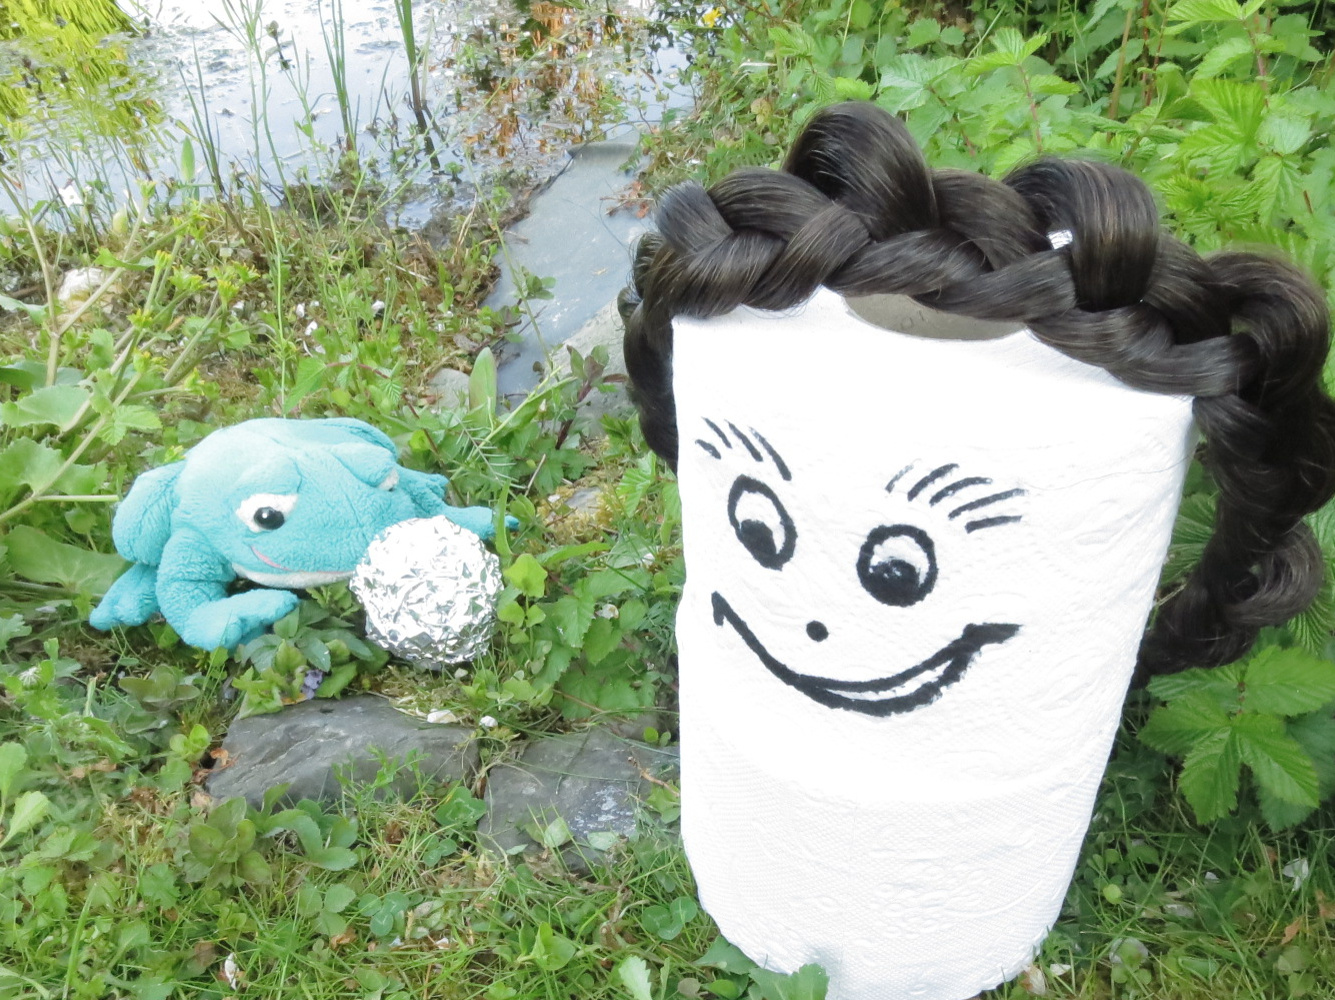 Märchen raten mit Magic Tribal Hair (Lese- bzw. Ratezeit 3 Minuten)